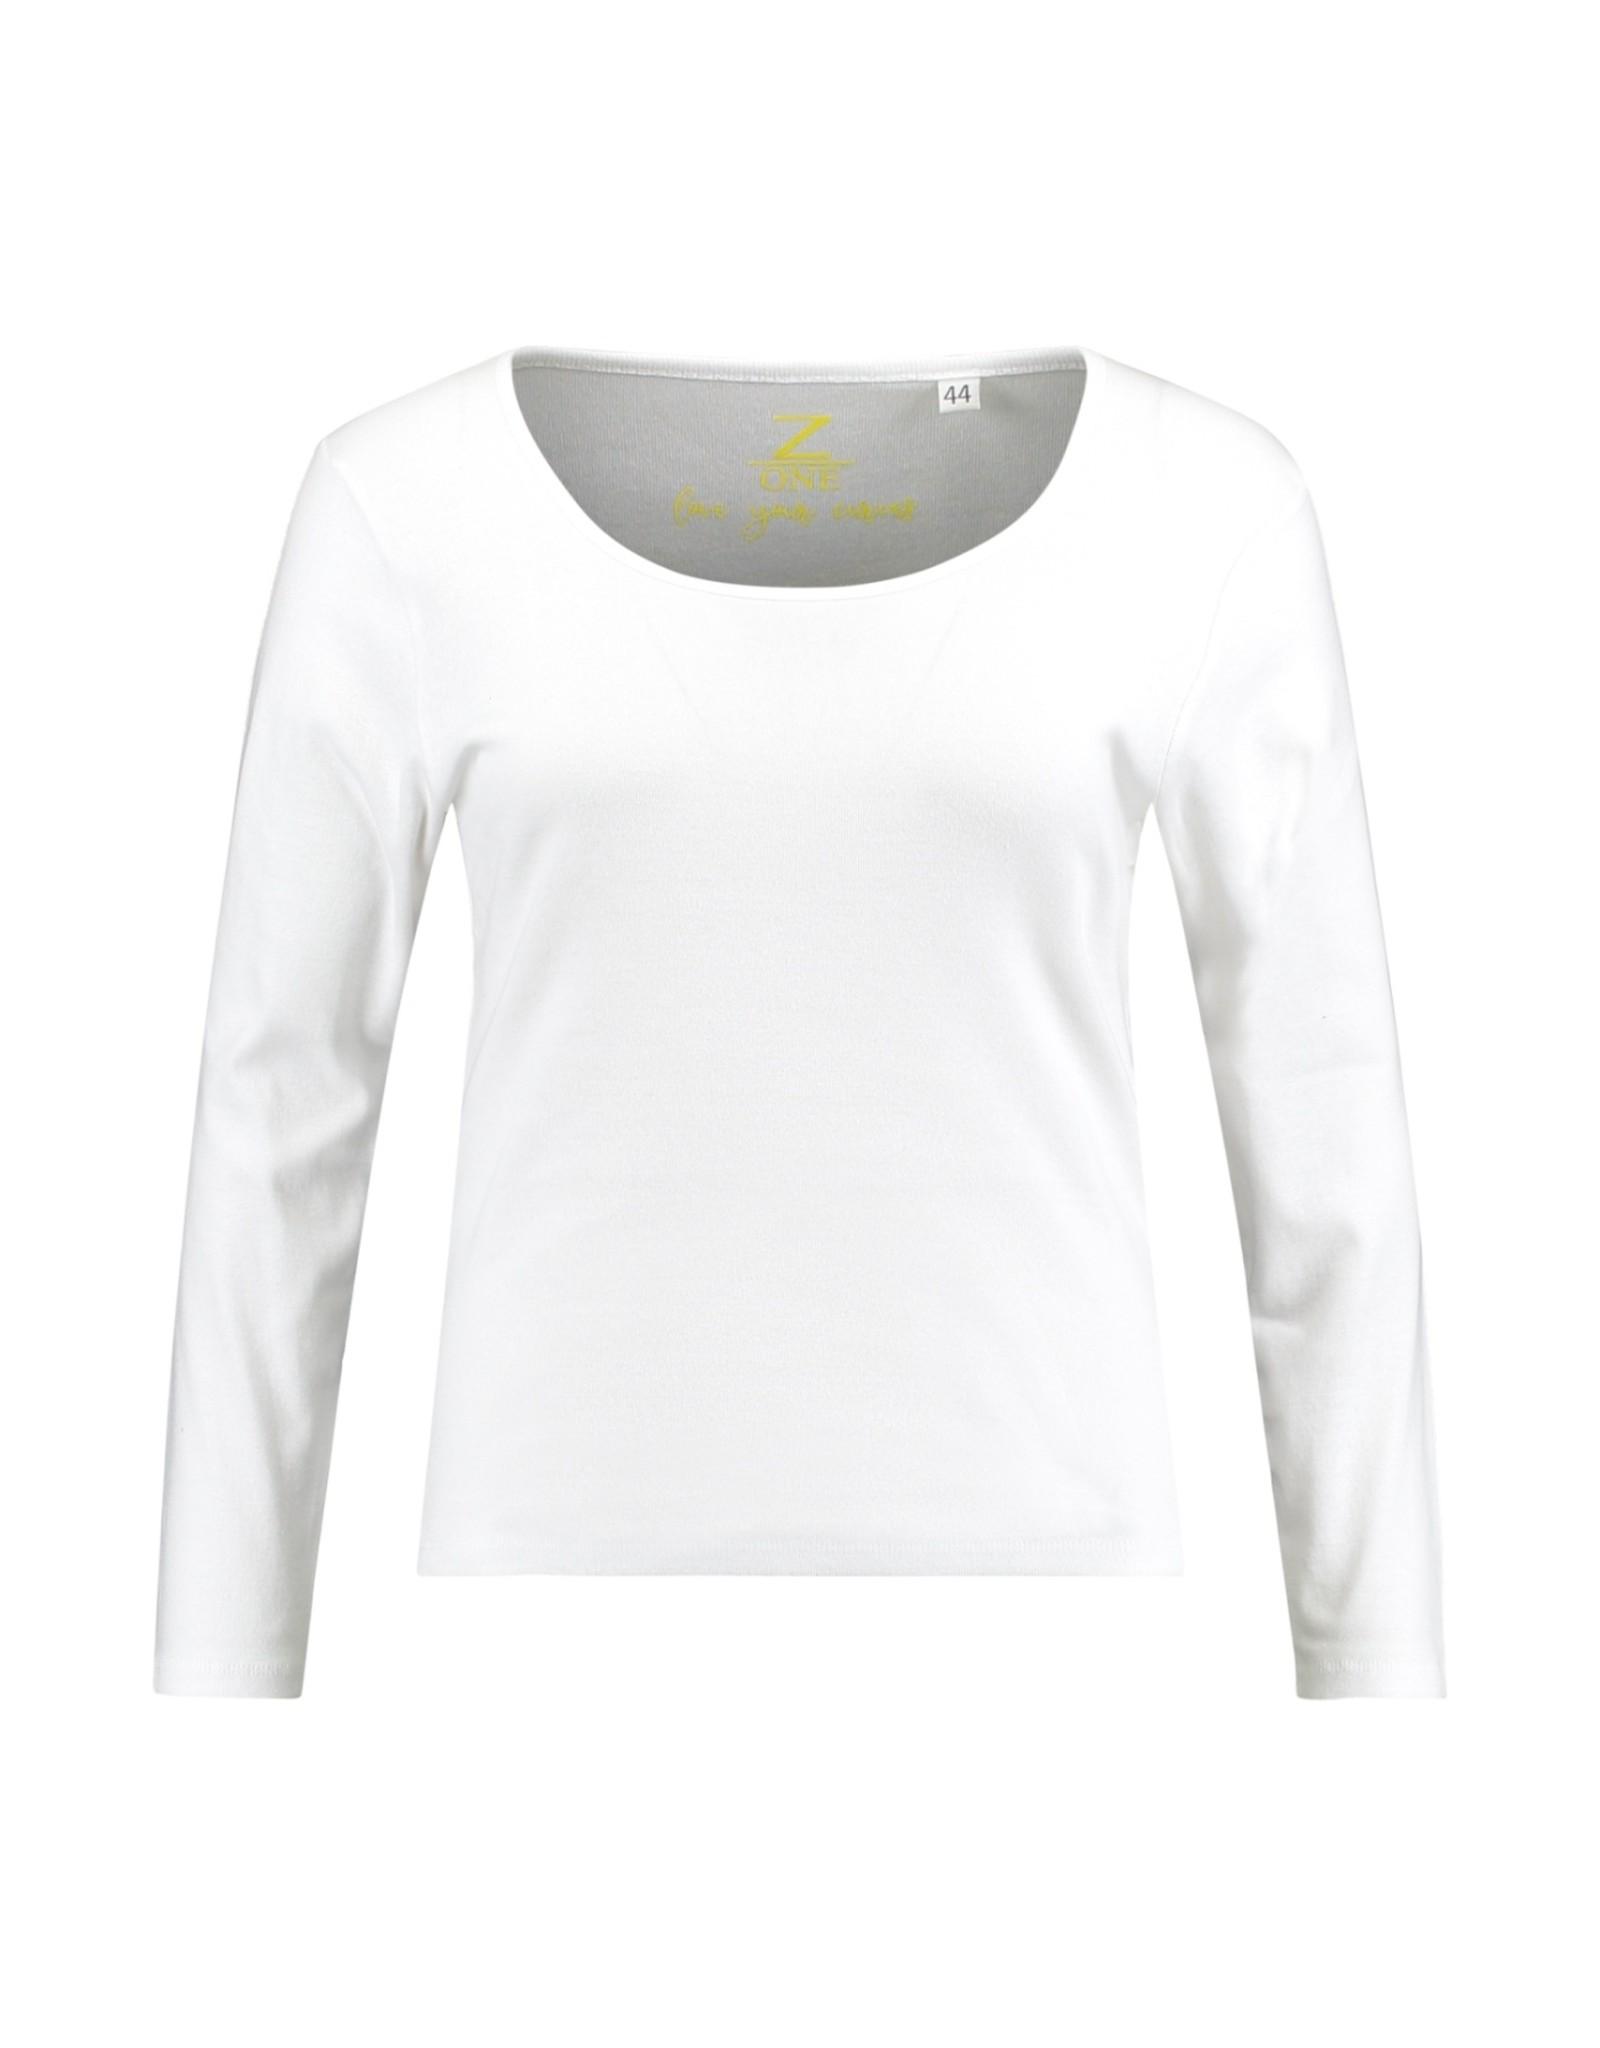 Z-ONE T-shirt Donna Z1 White